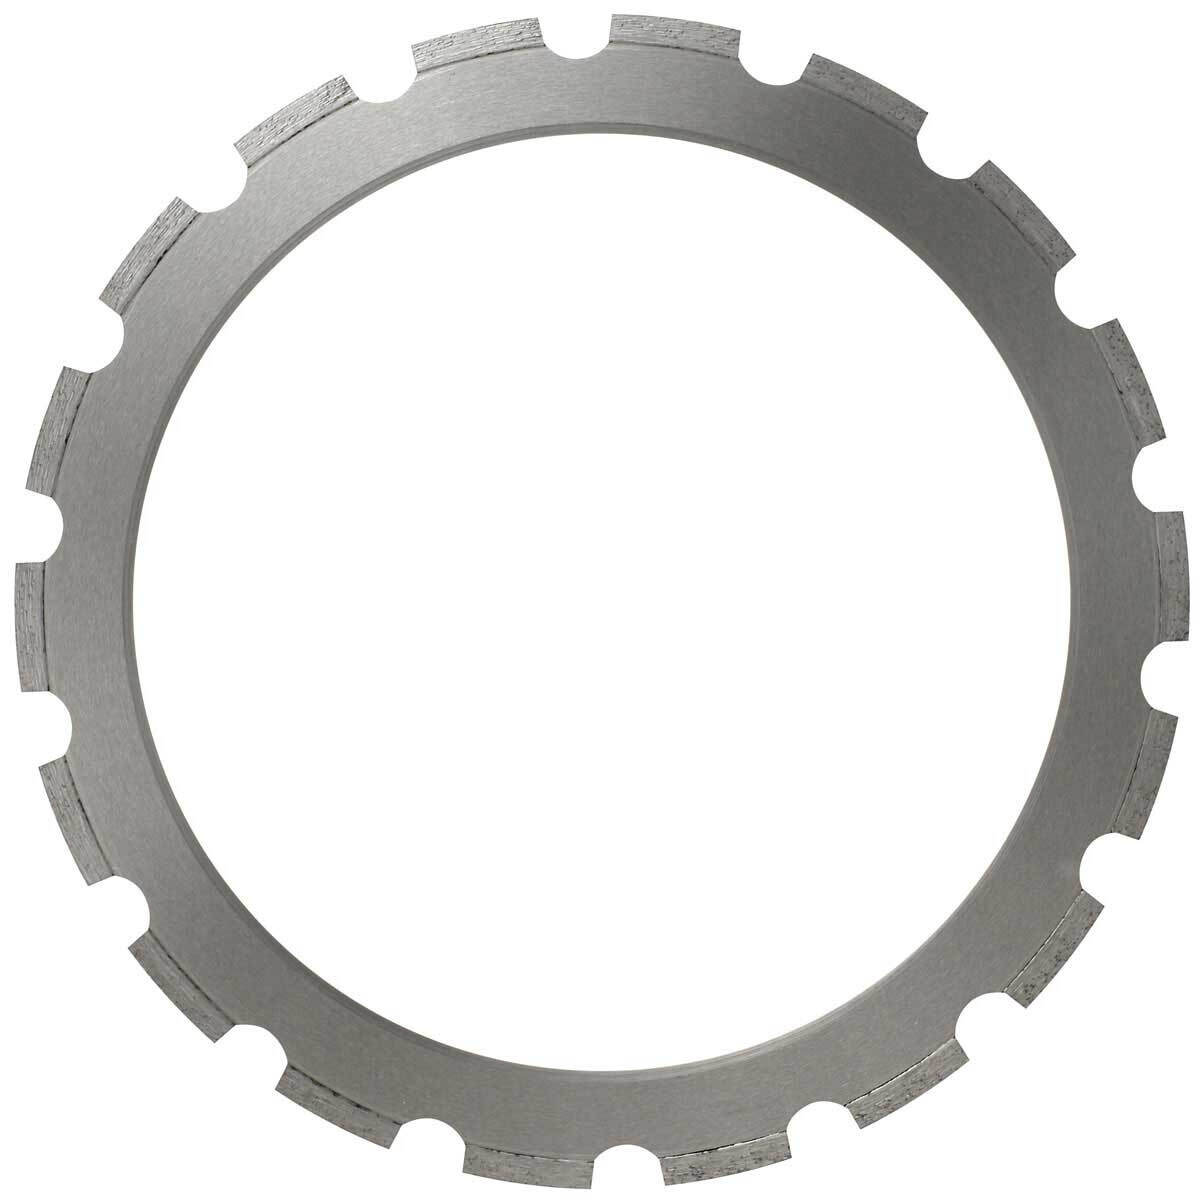 MK 14 inch RS Premium Ring Saw Blade